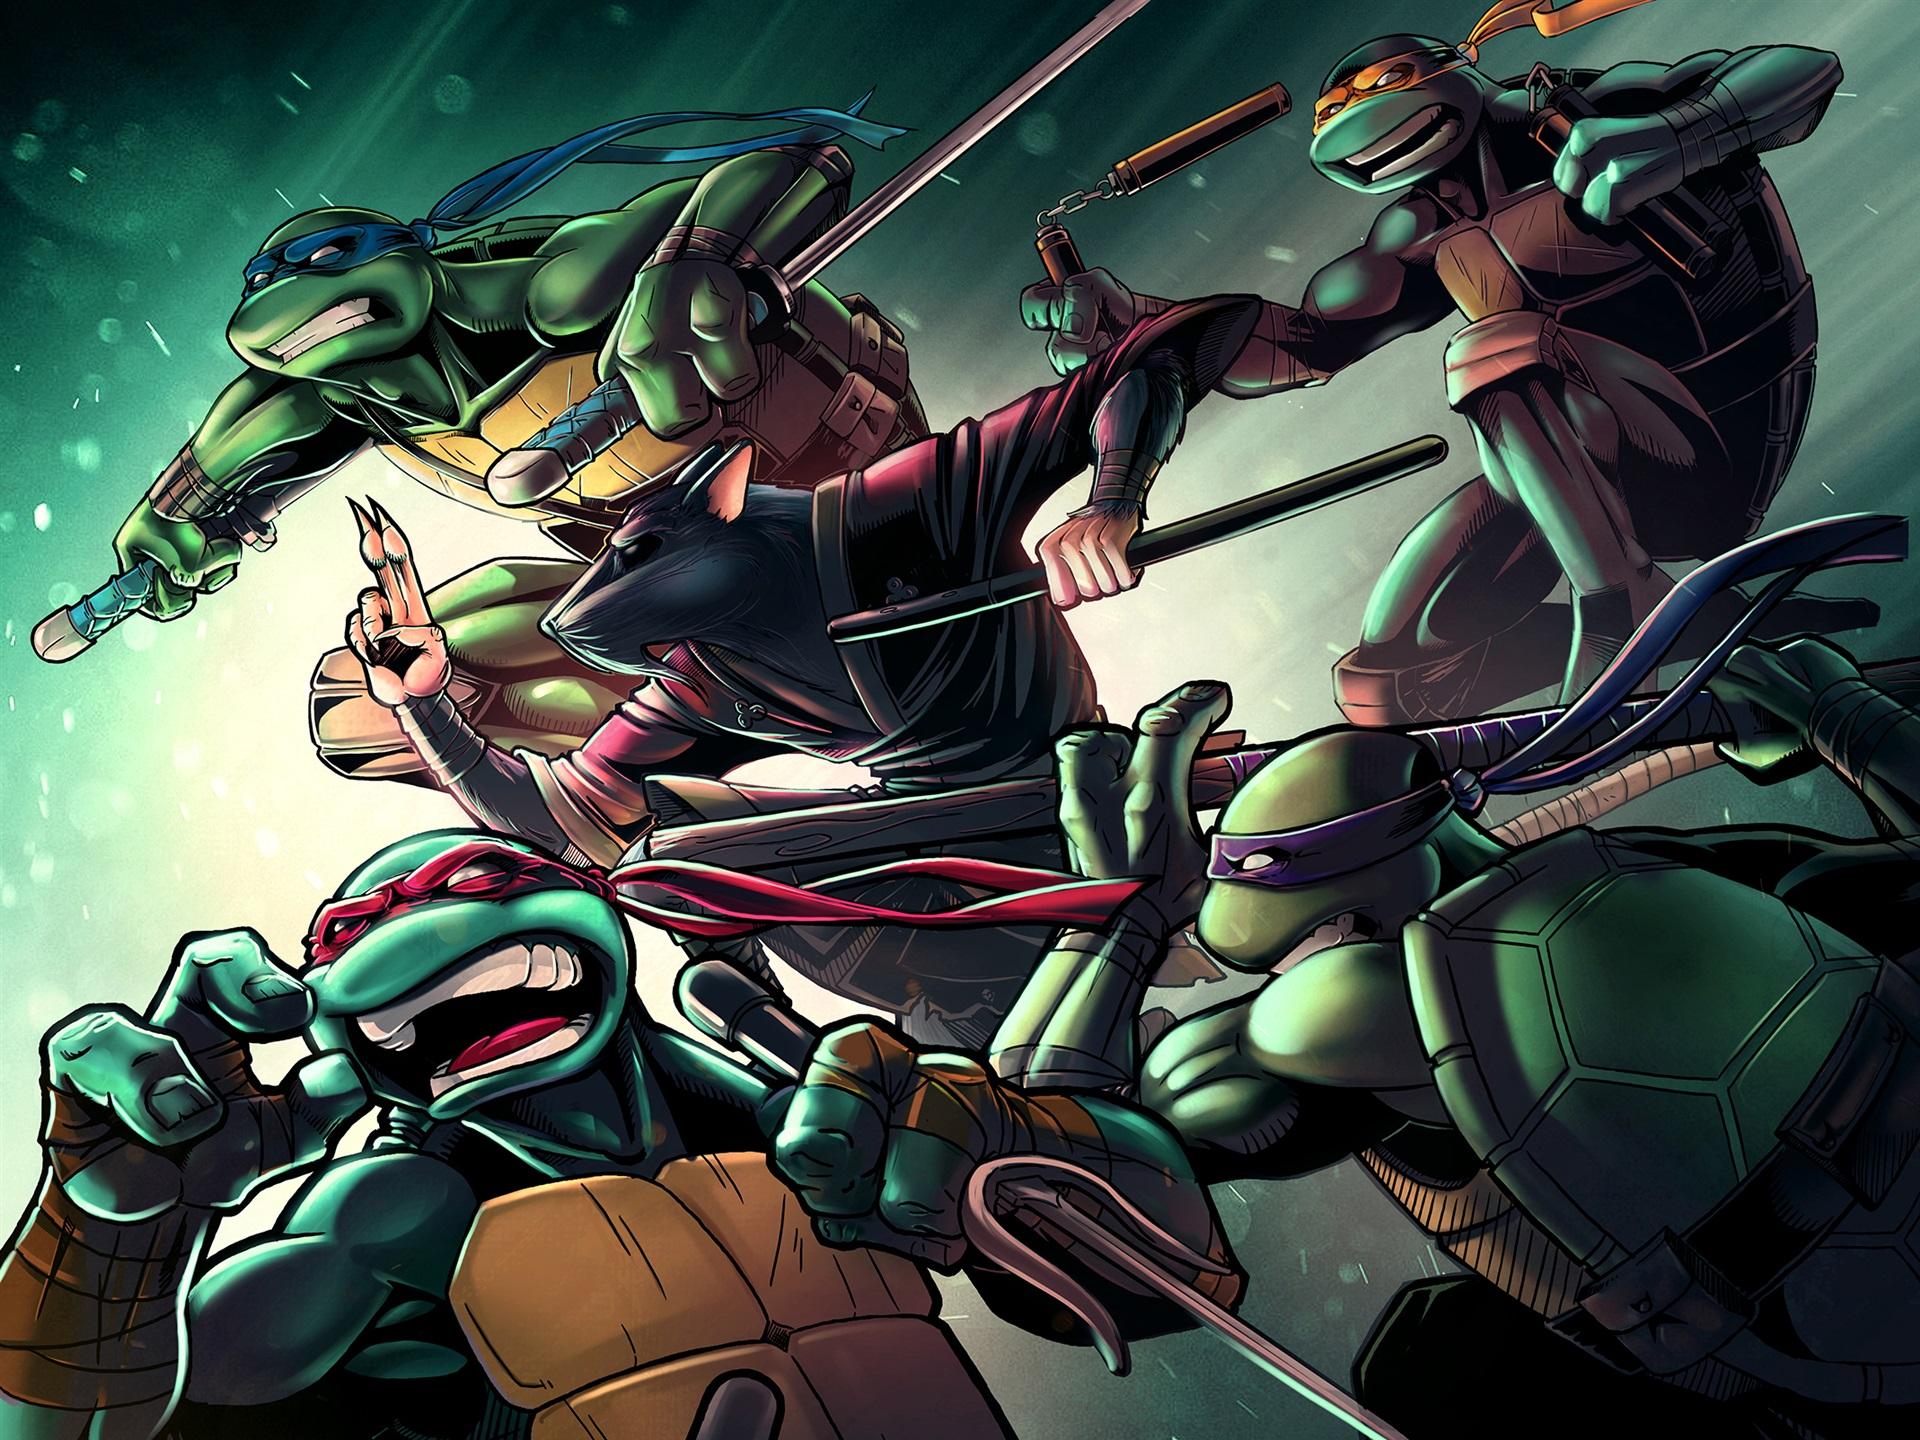 Wallpaper Teenage Mutant Ninja Turtles Classic Anime 1920x1440 Hd